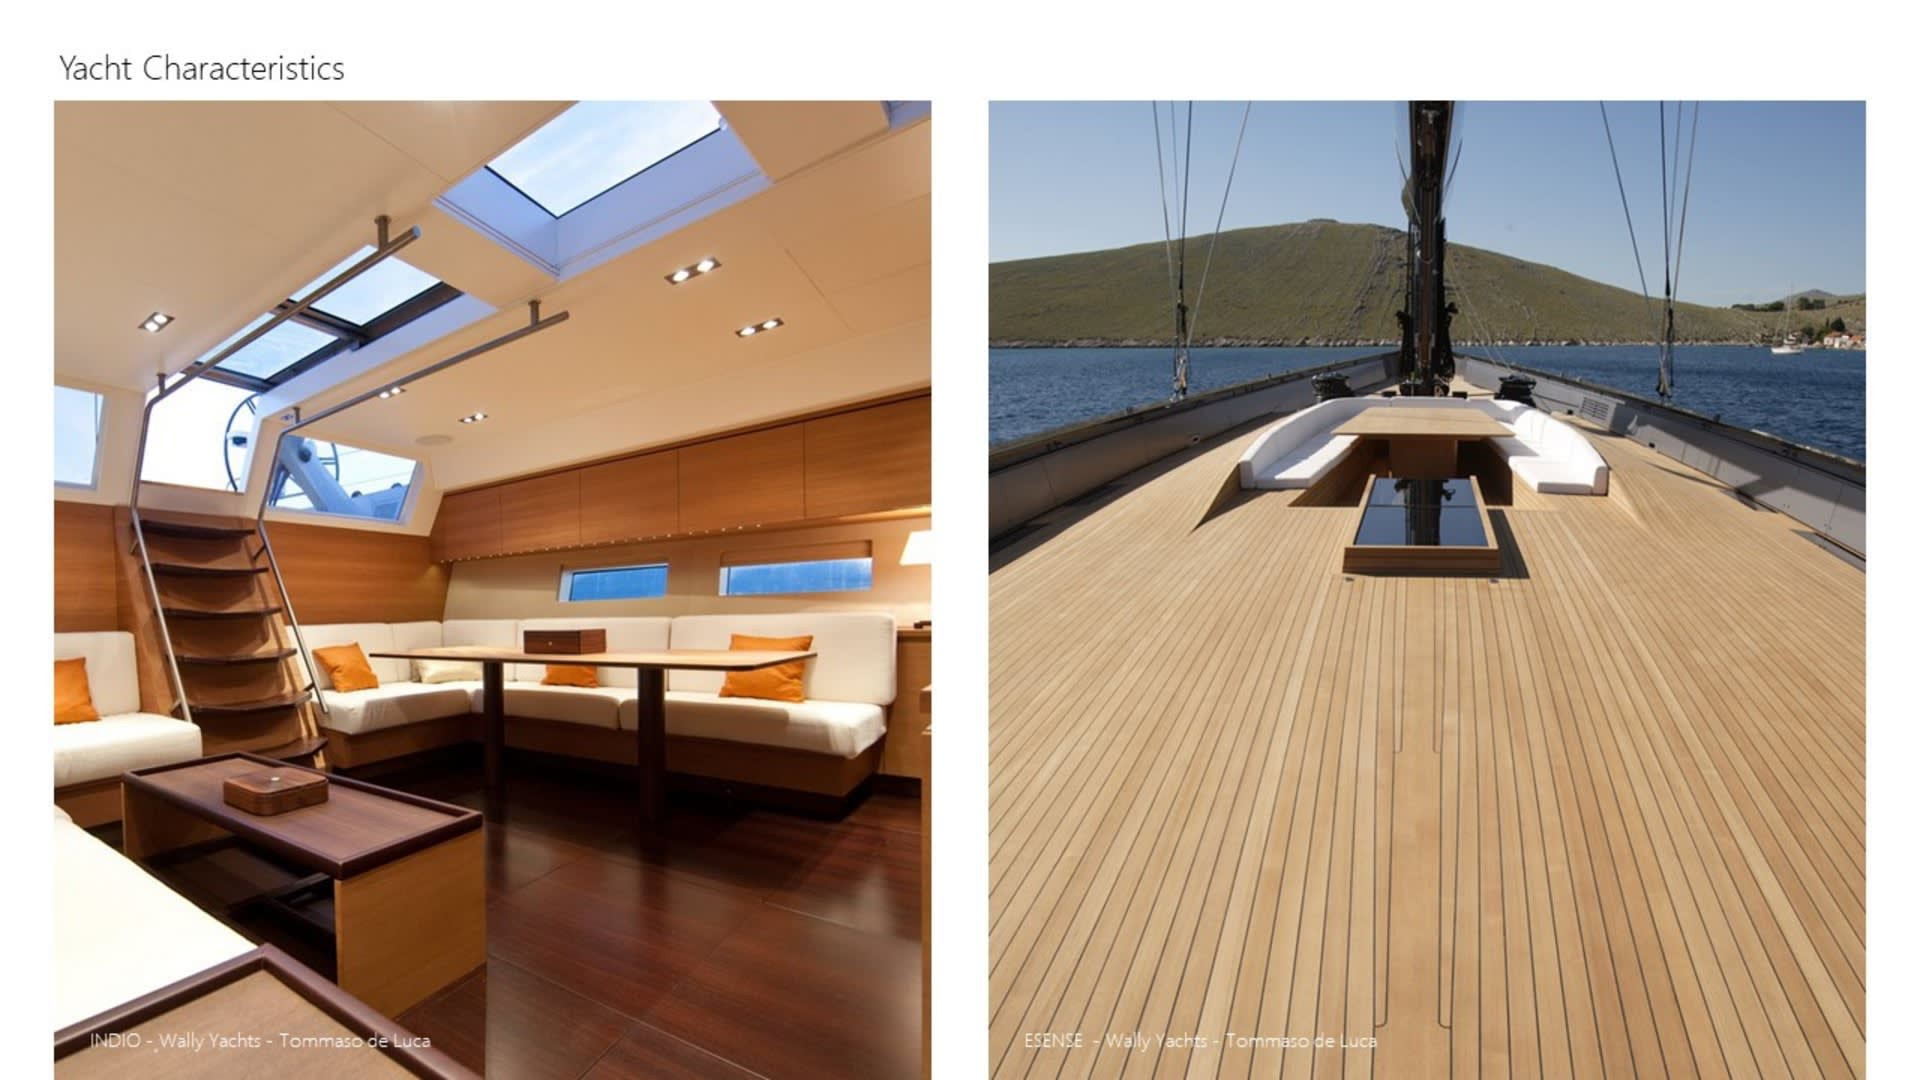 Yacht Inspired Interior